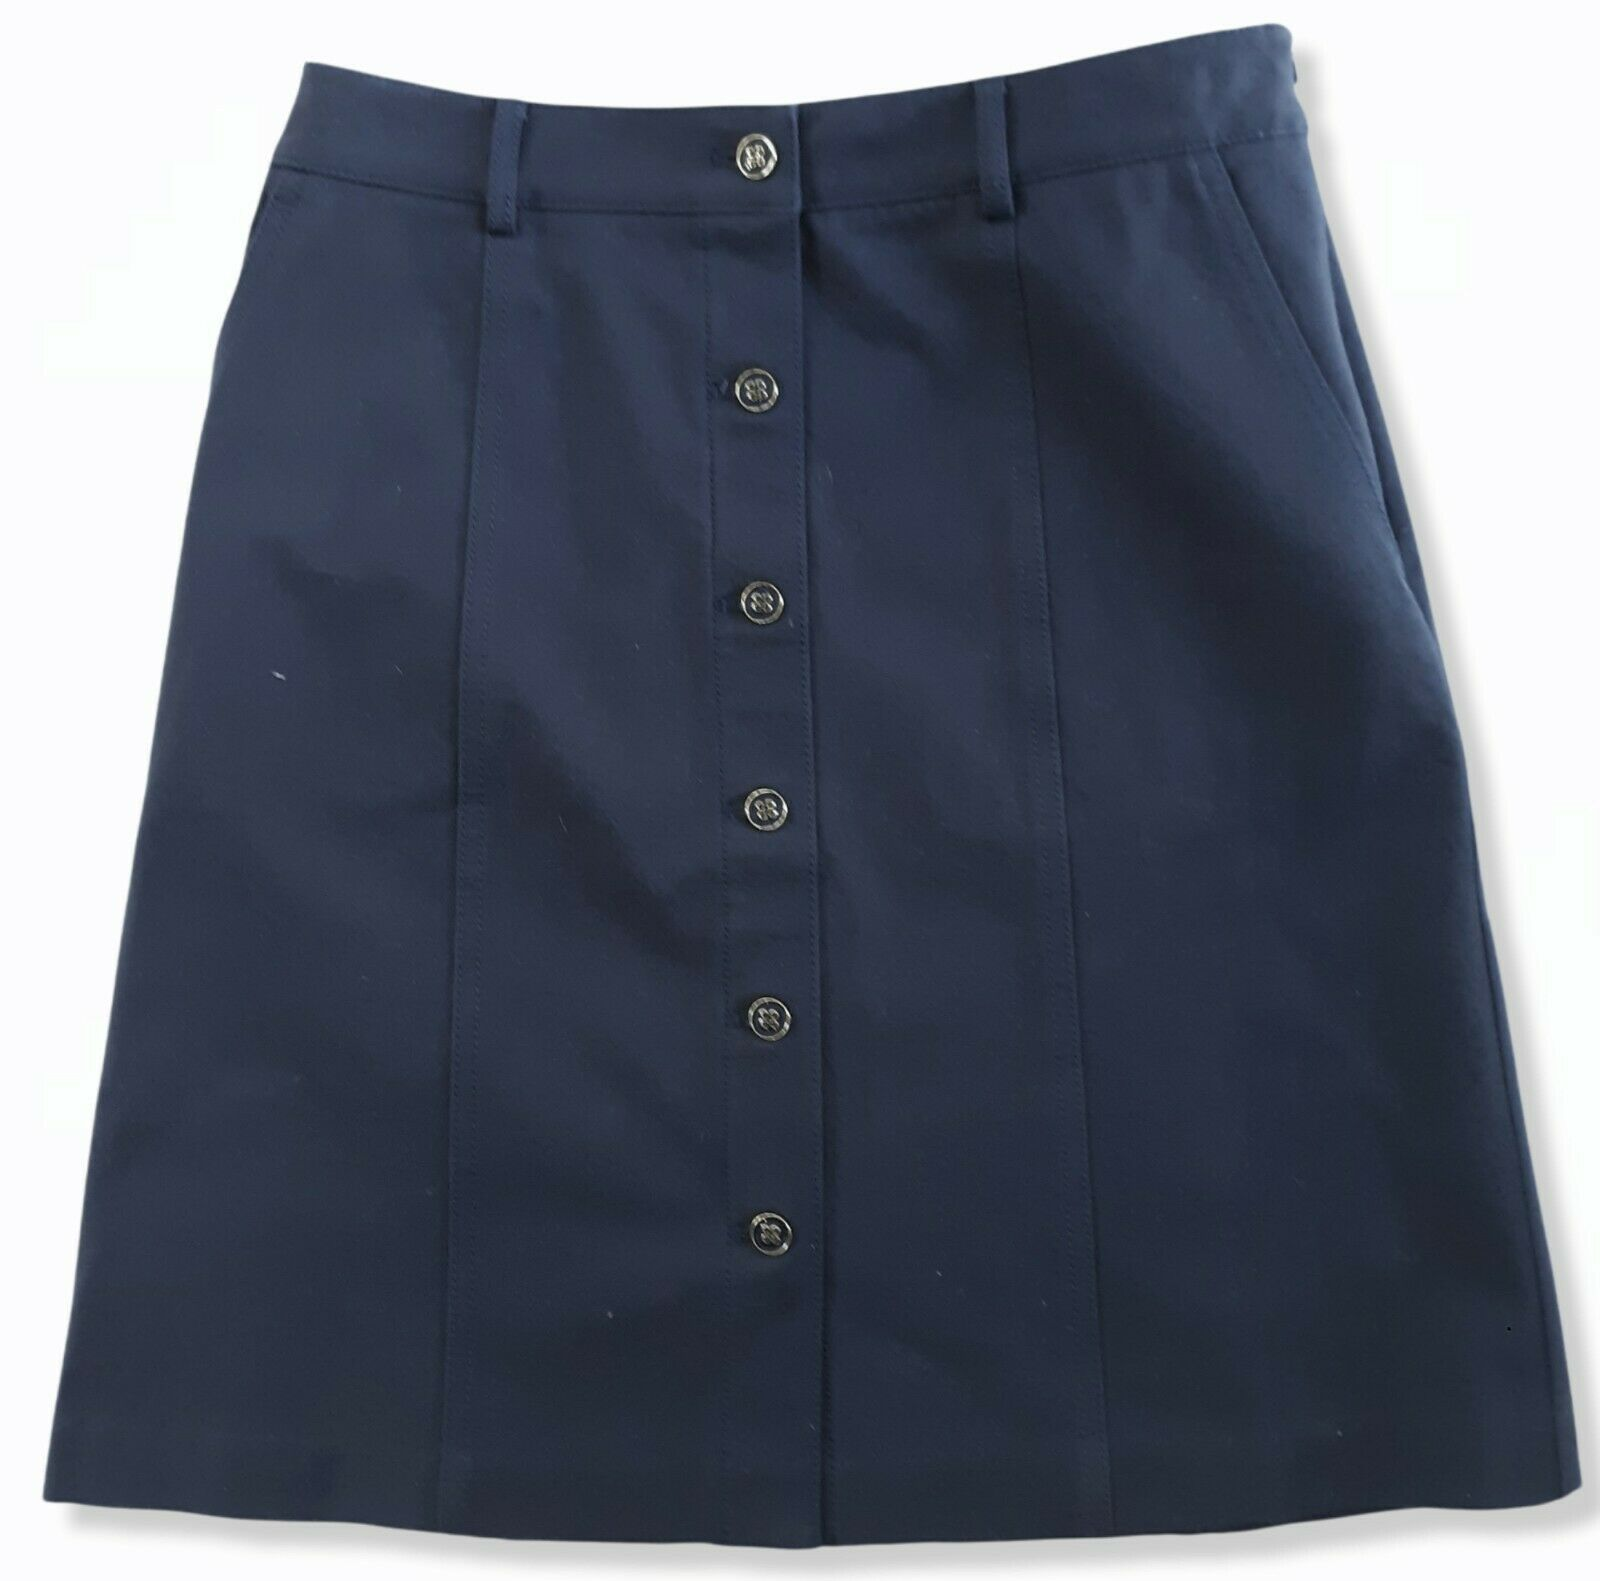 J McLaughlin Teal Button Front A Line Skirt Size 2 - image 1